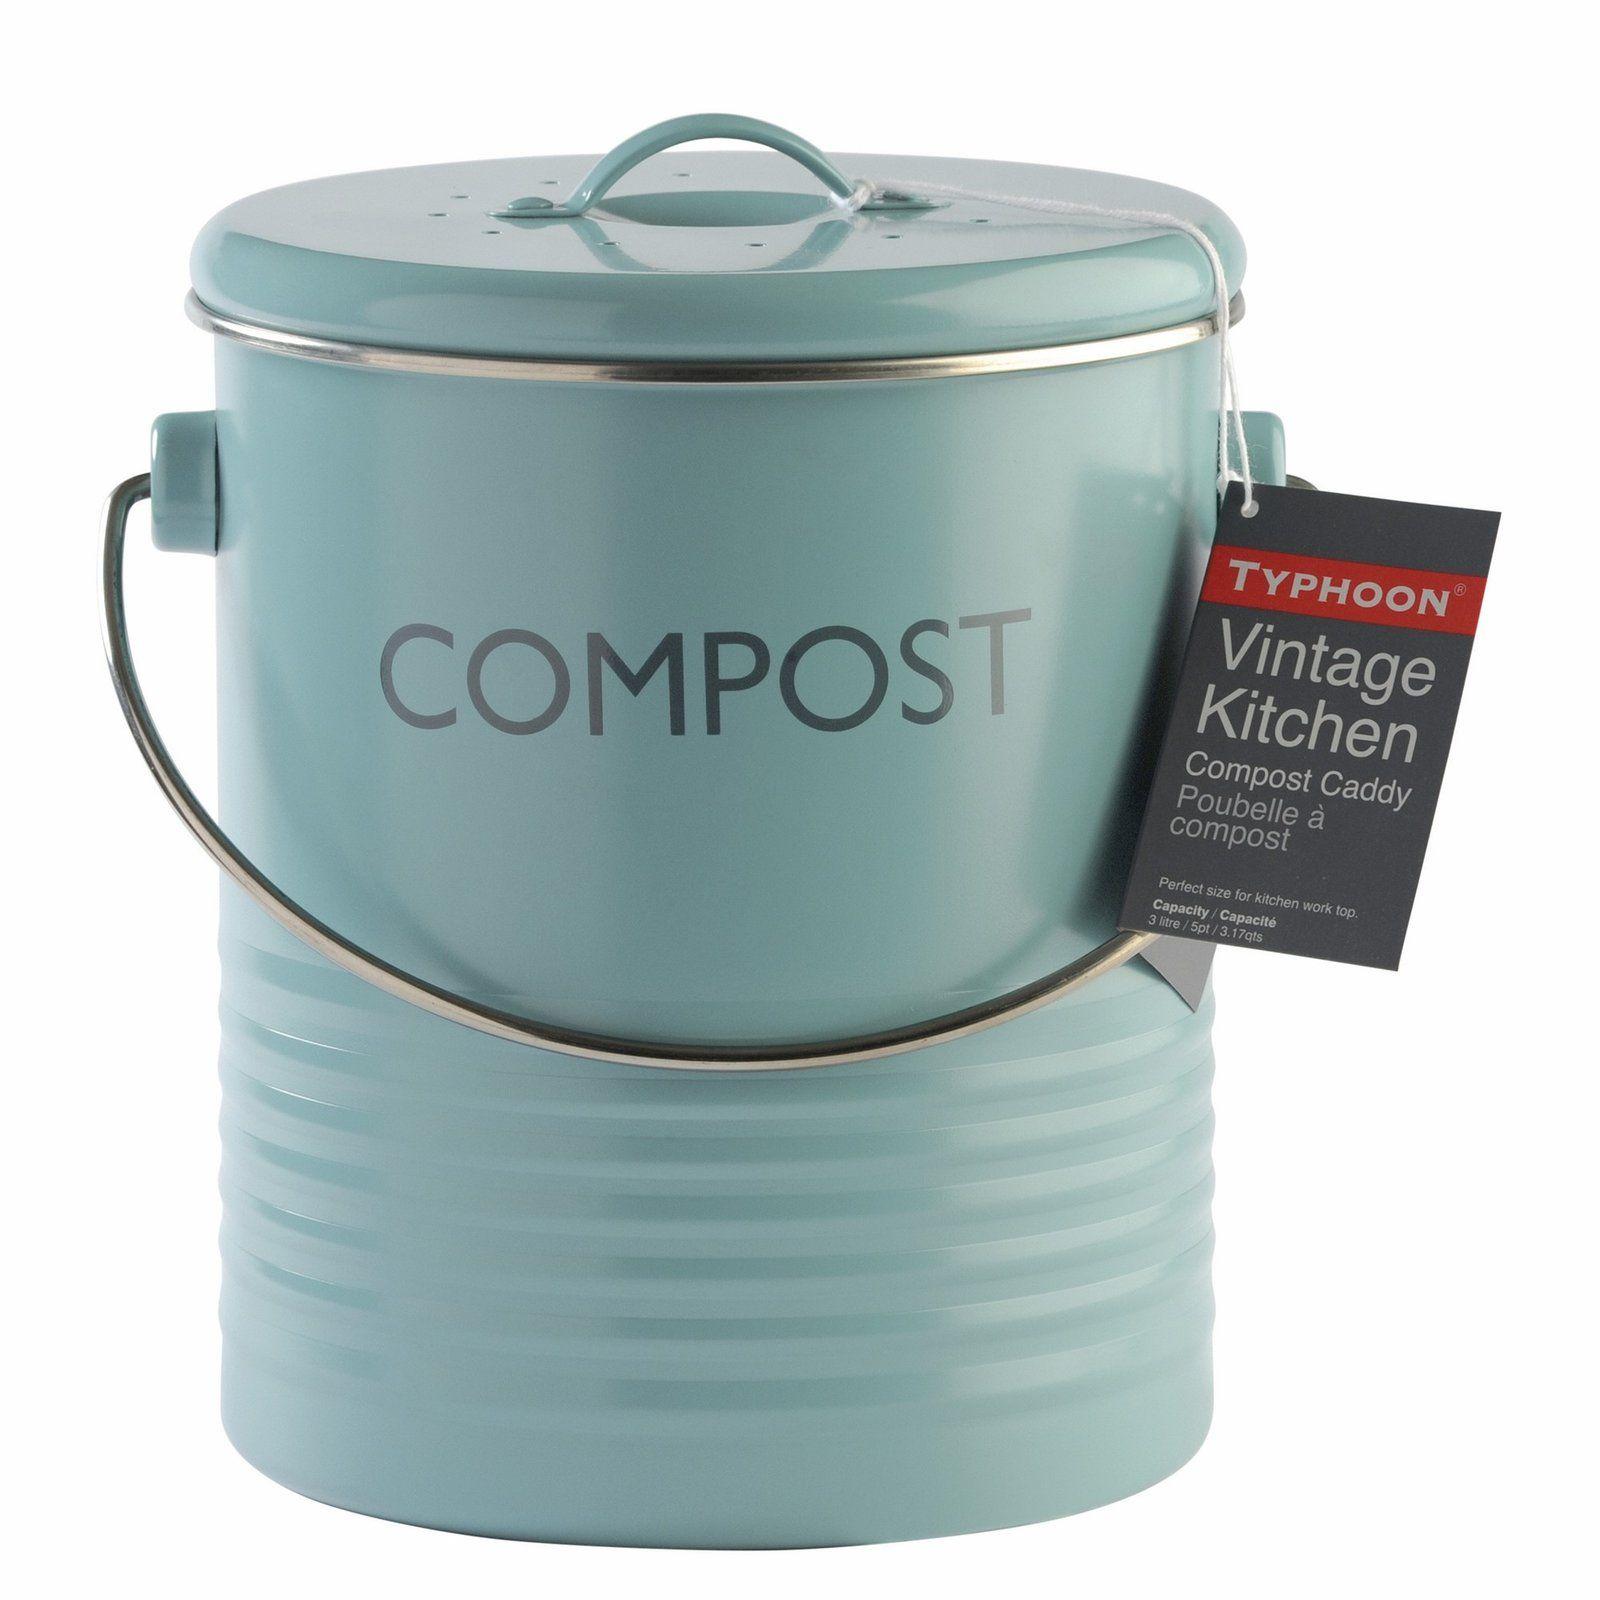 Summerhouse Compost Waste Basket